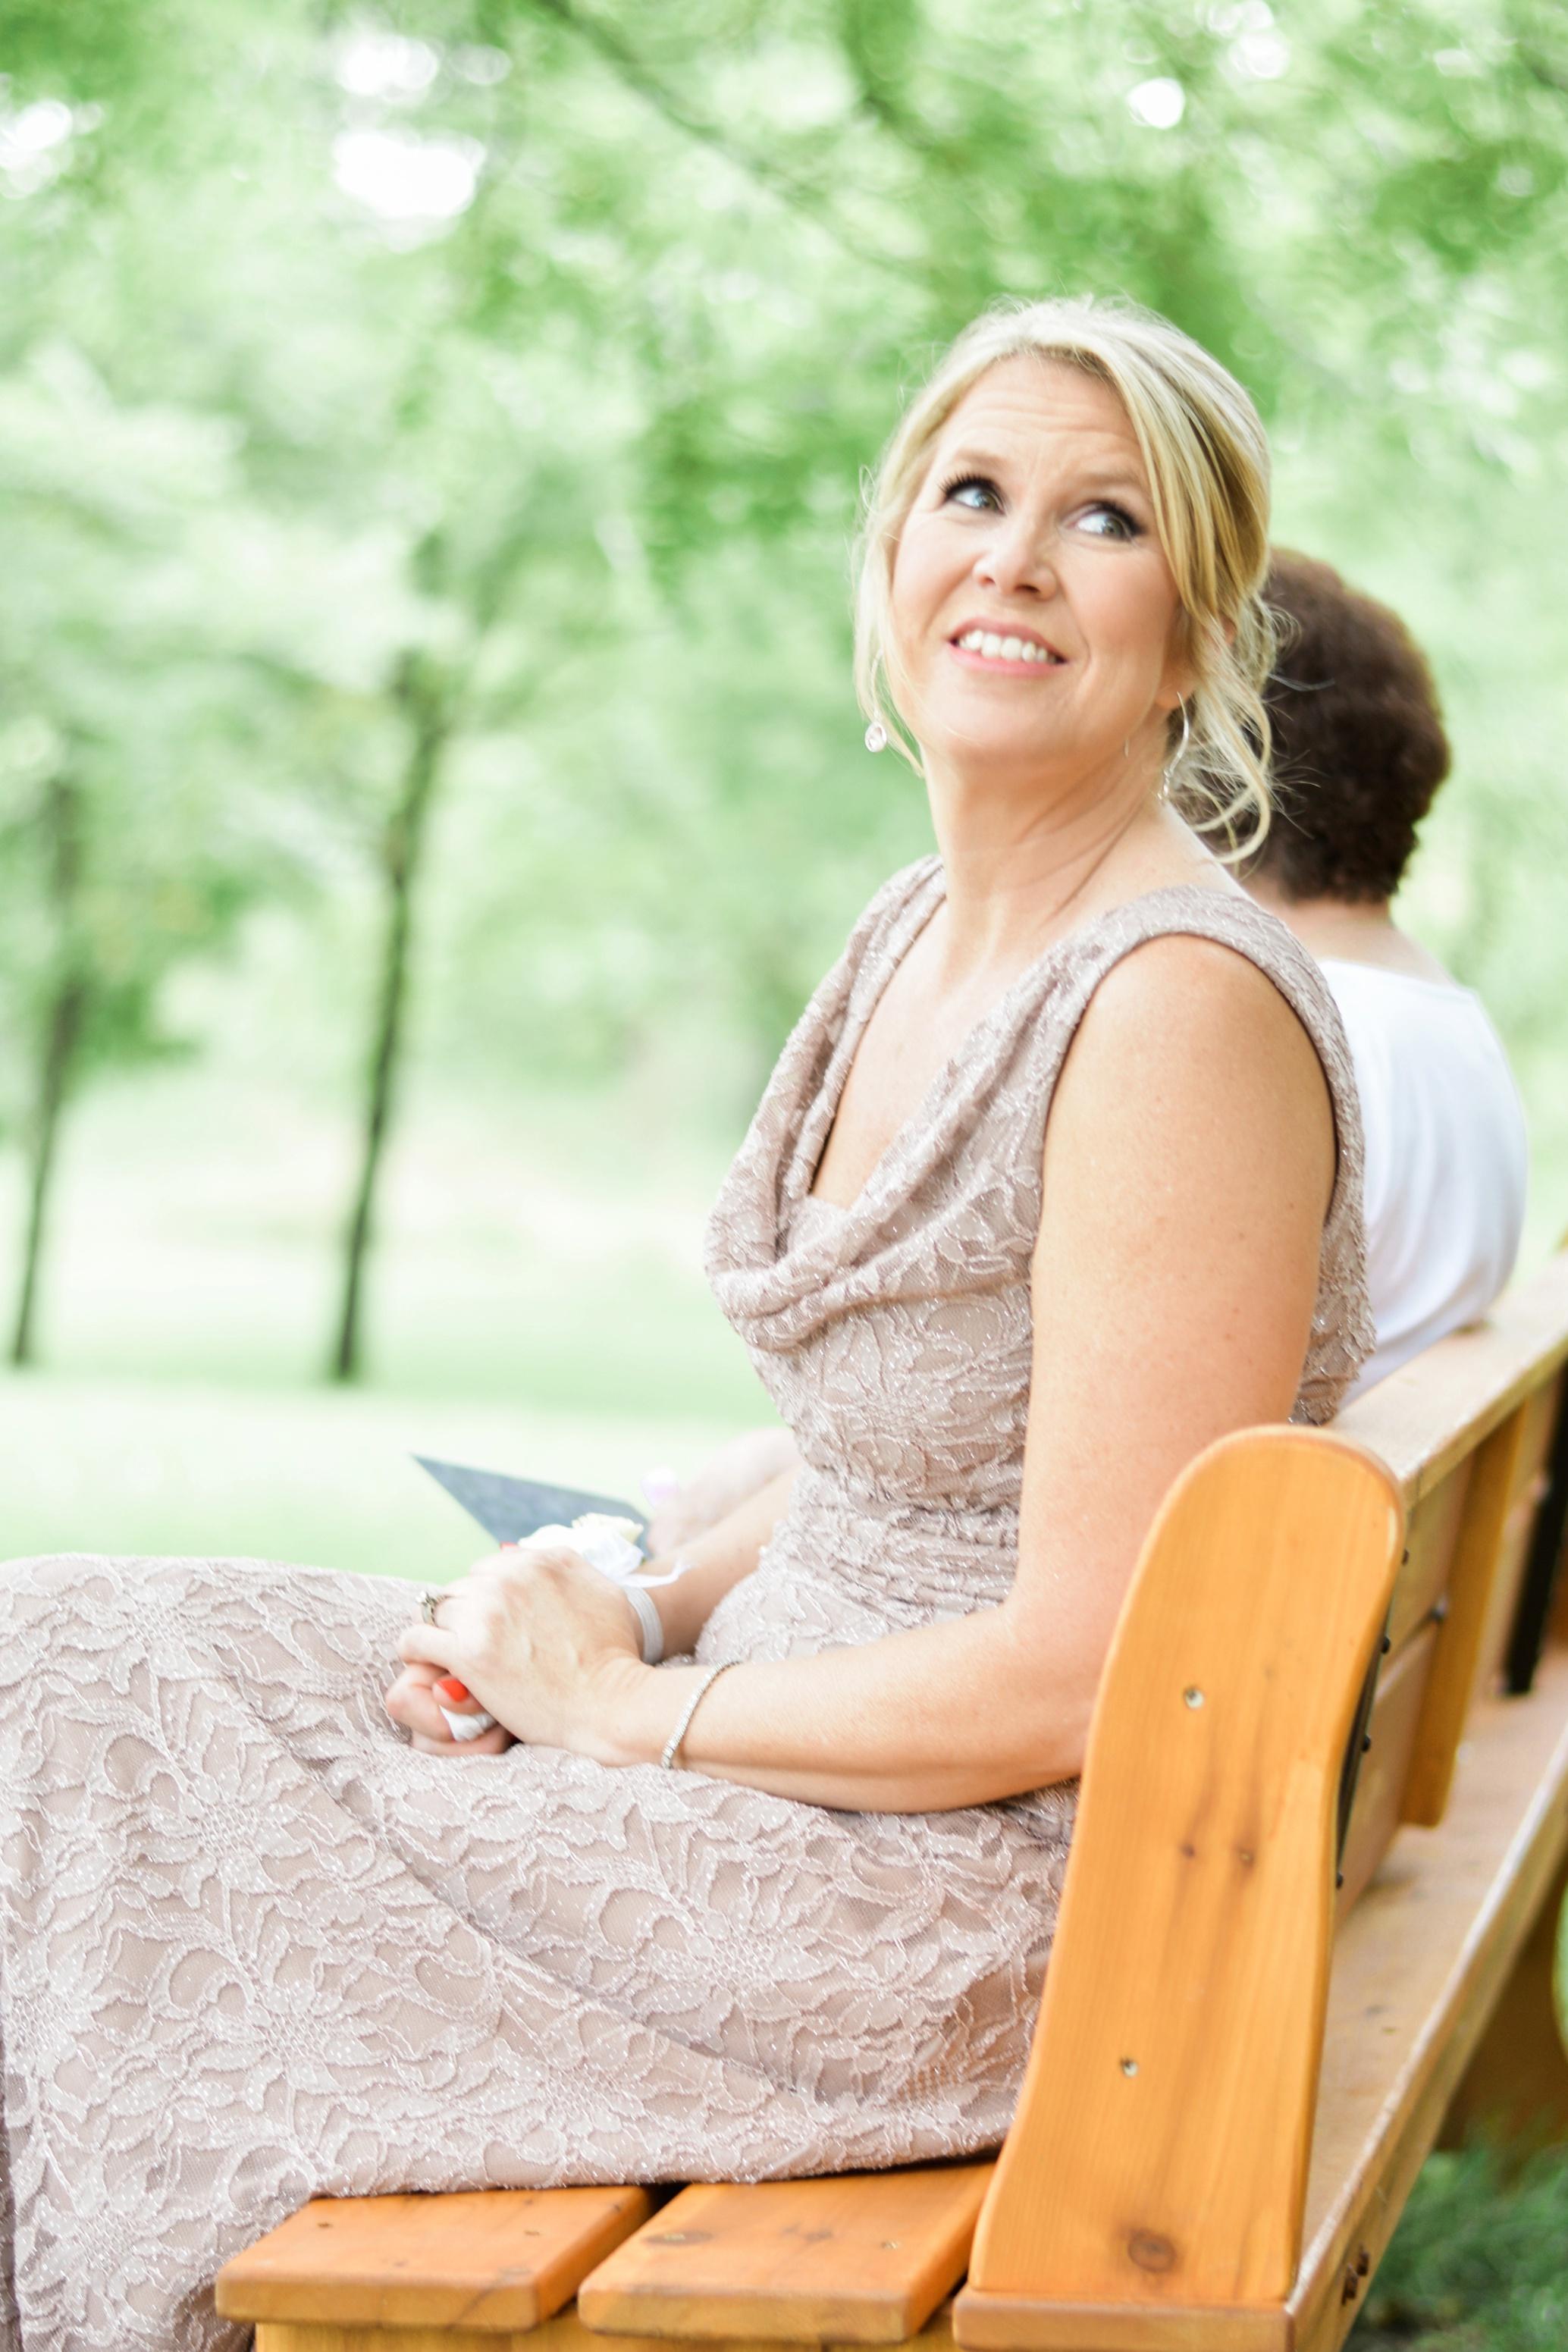 Barnes' Place Rustic Outdoor Wedding | Ali Leigh Photo Minneapolis Wedding Photographer_0106.jpg